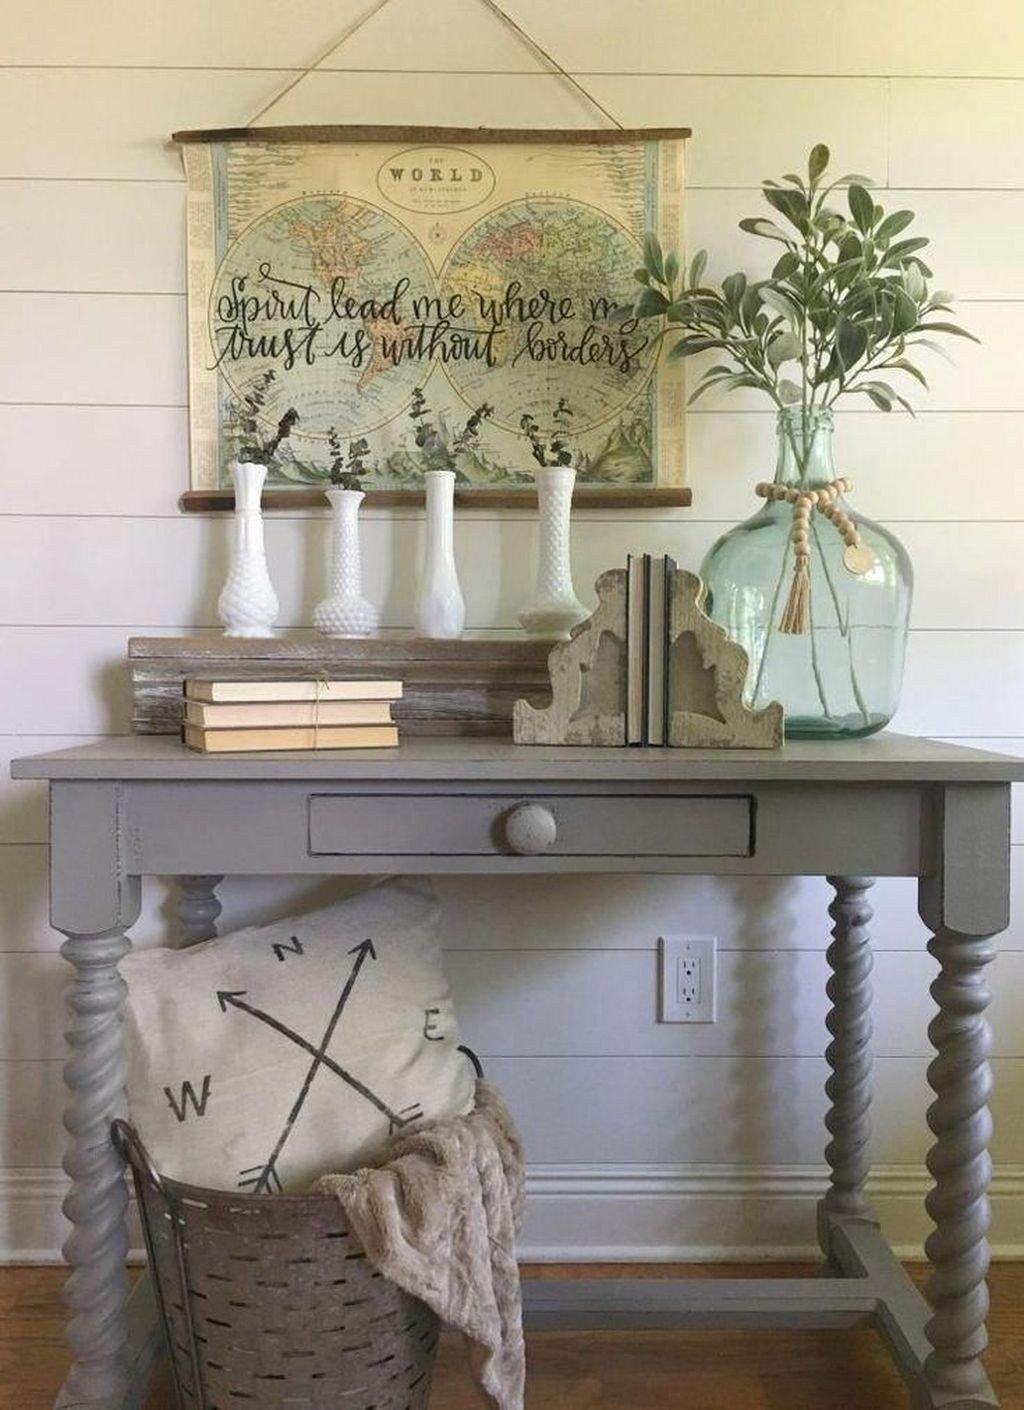 enchanting farmhouse spring decor ideas for your house43 ...